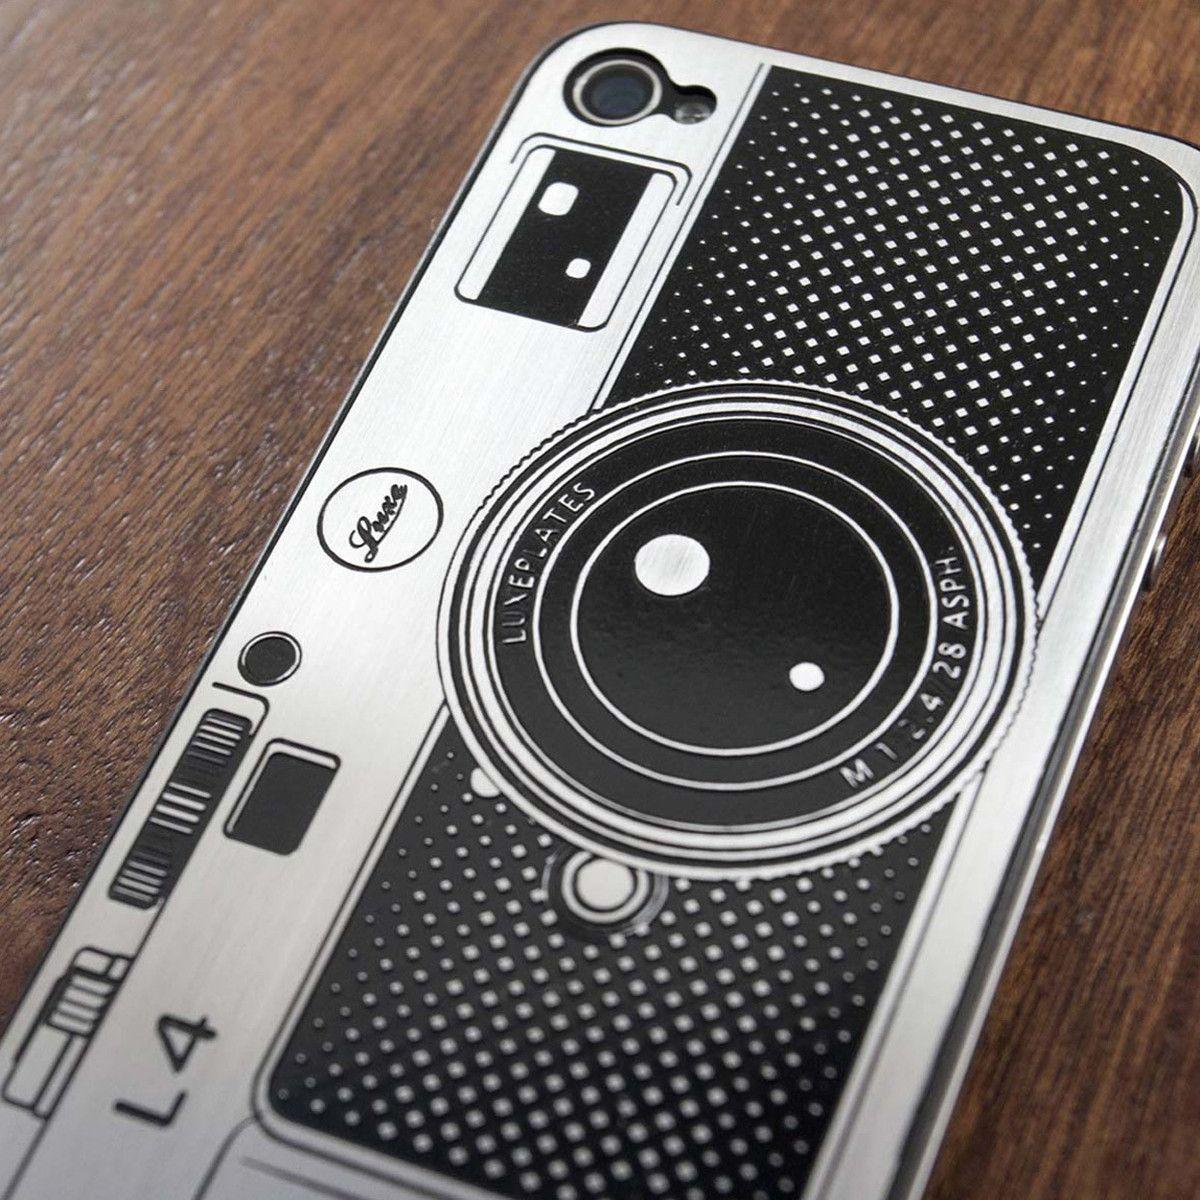 eu.Fab.com   iPhone-Plate Kamera 4/4S   Tipps ...